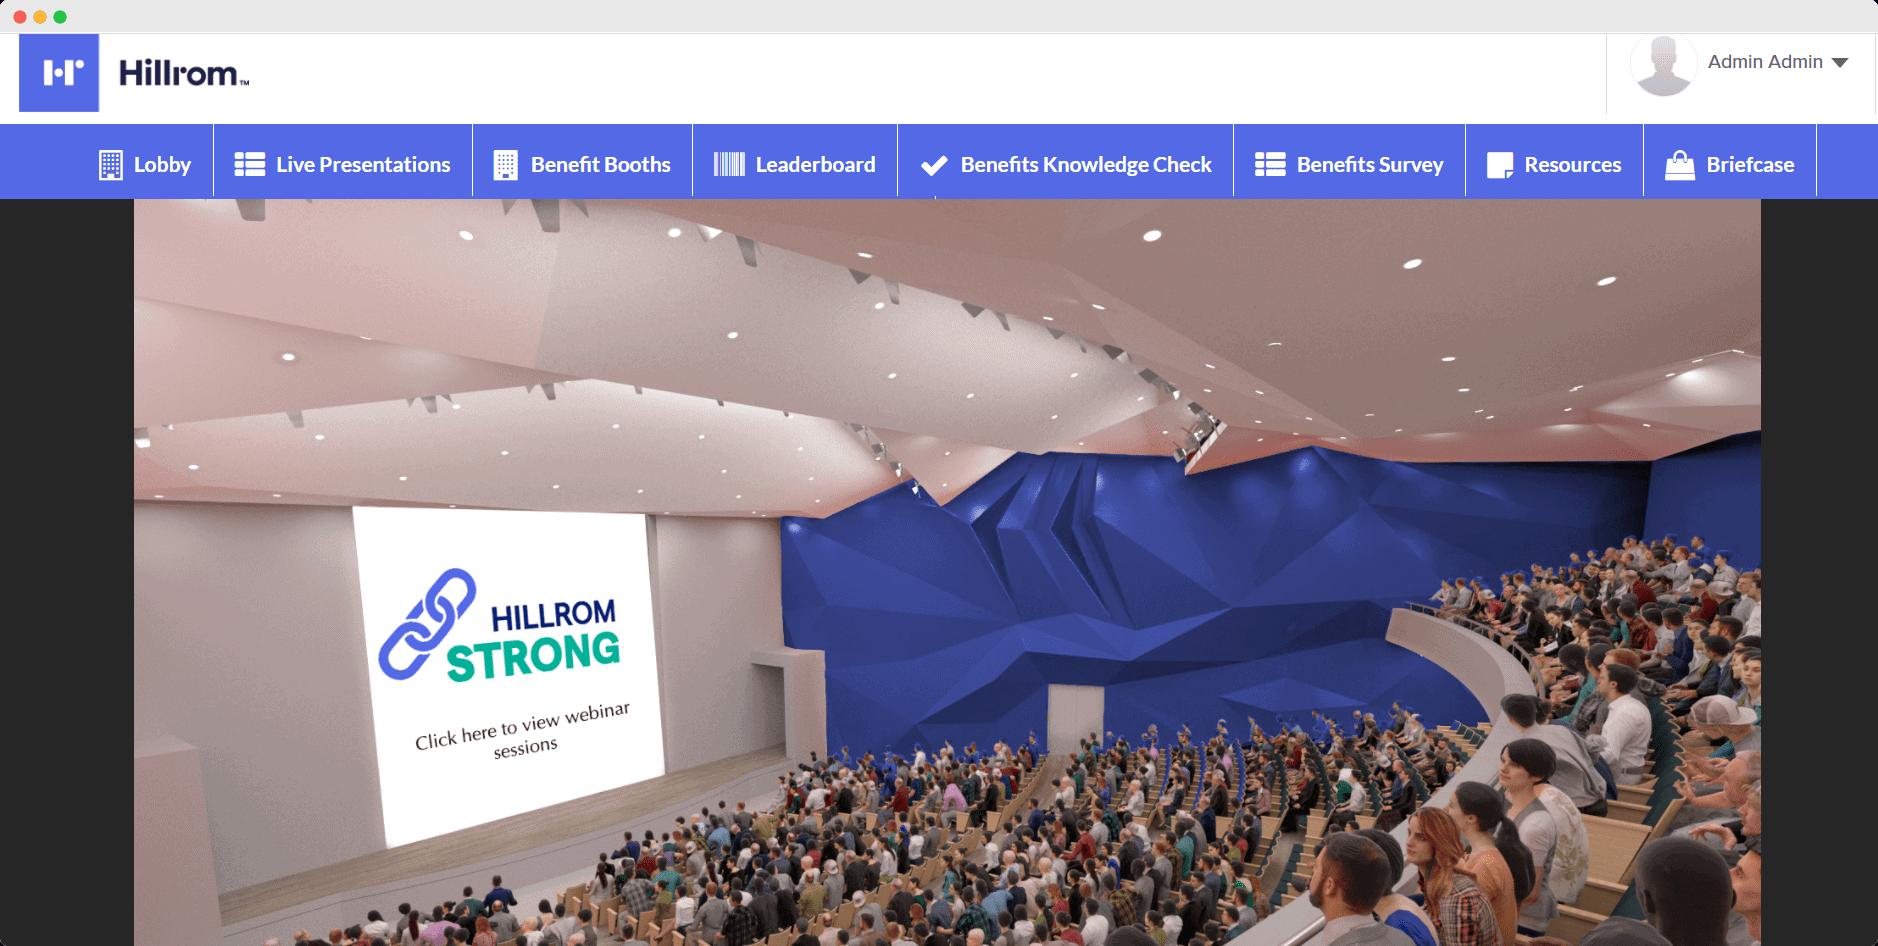 Hillrom virtual benefits fair auditorium